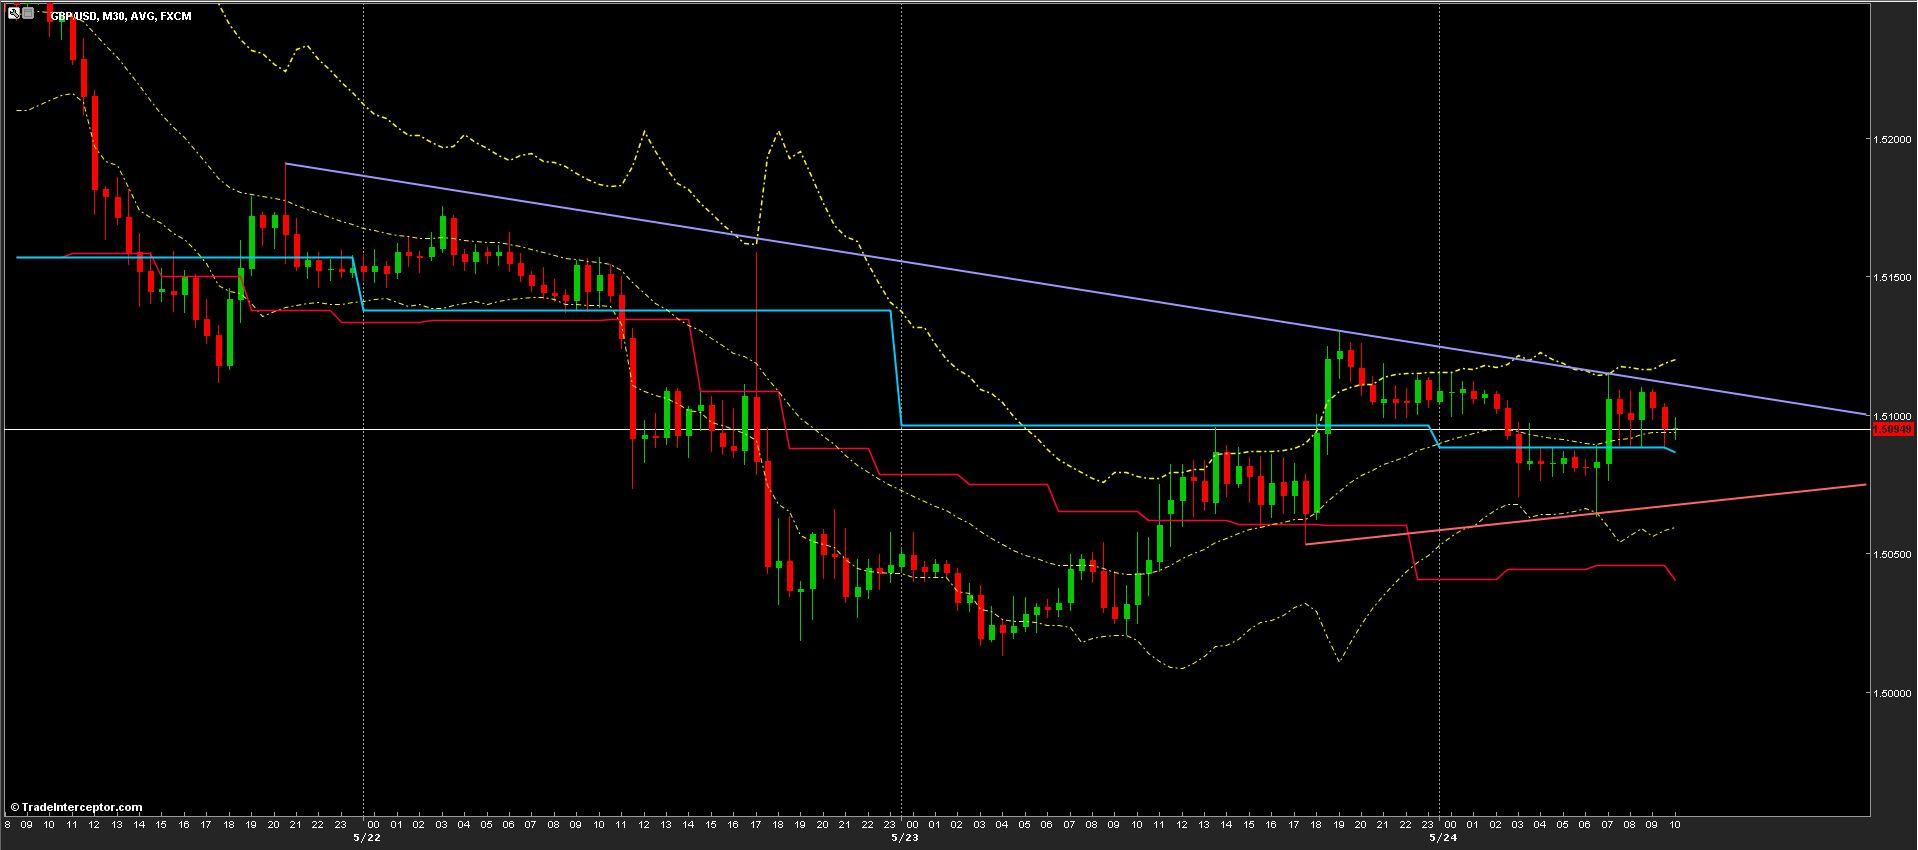 GBP/USD Chart 24/05/2013